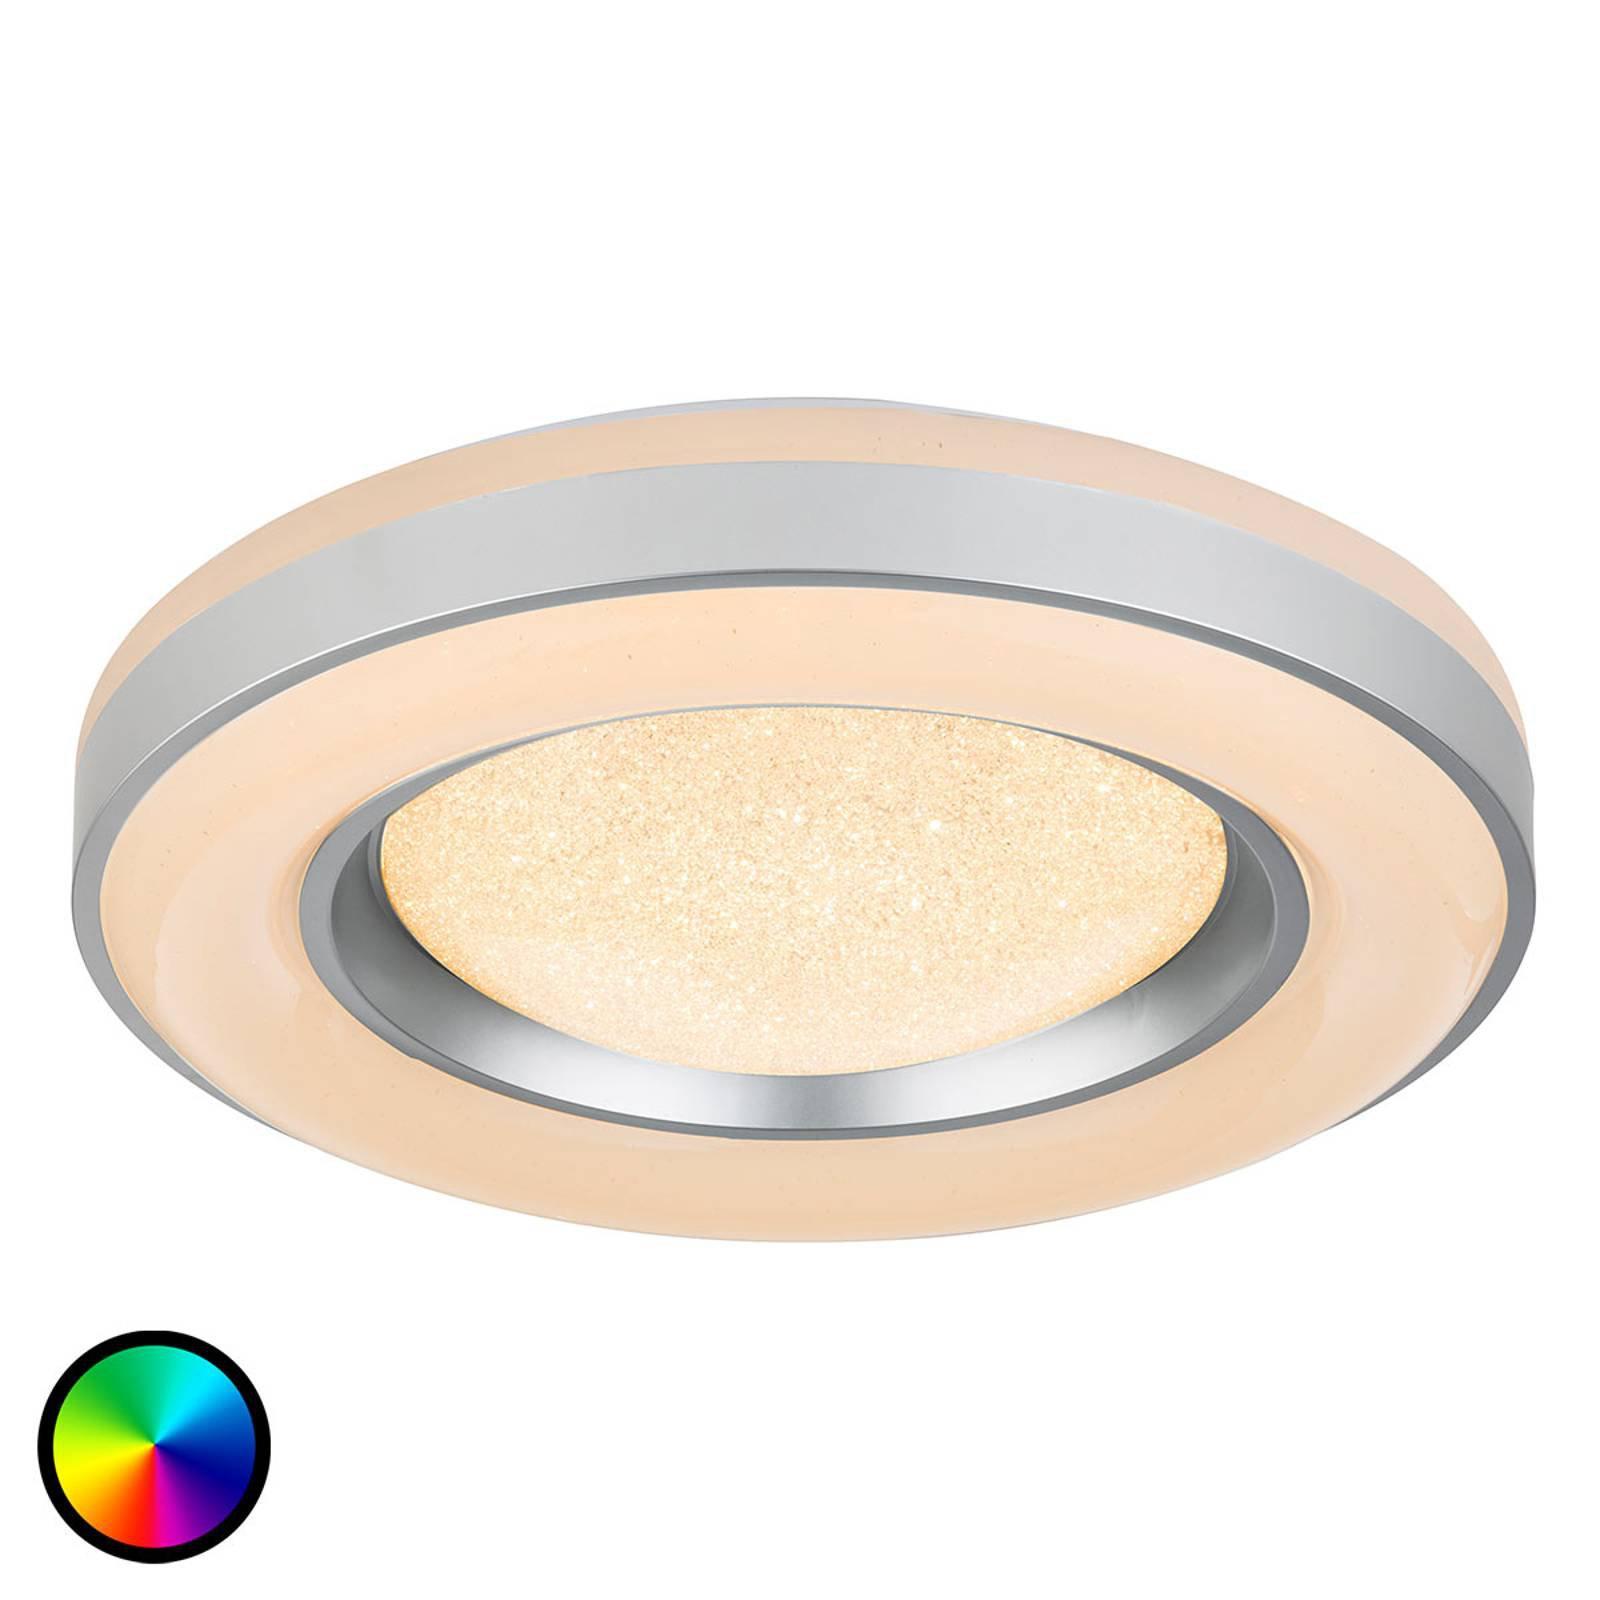 LED-taklampe Colla med fjernkontroll